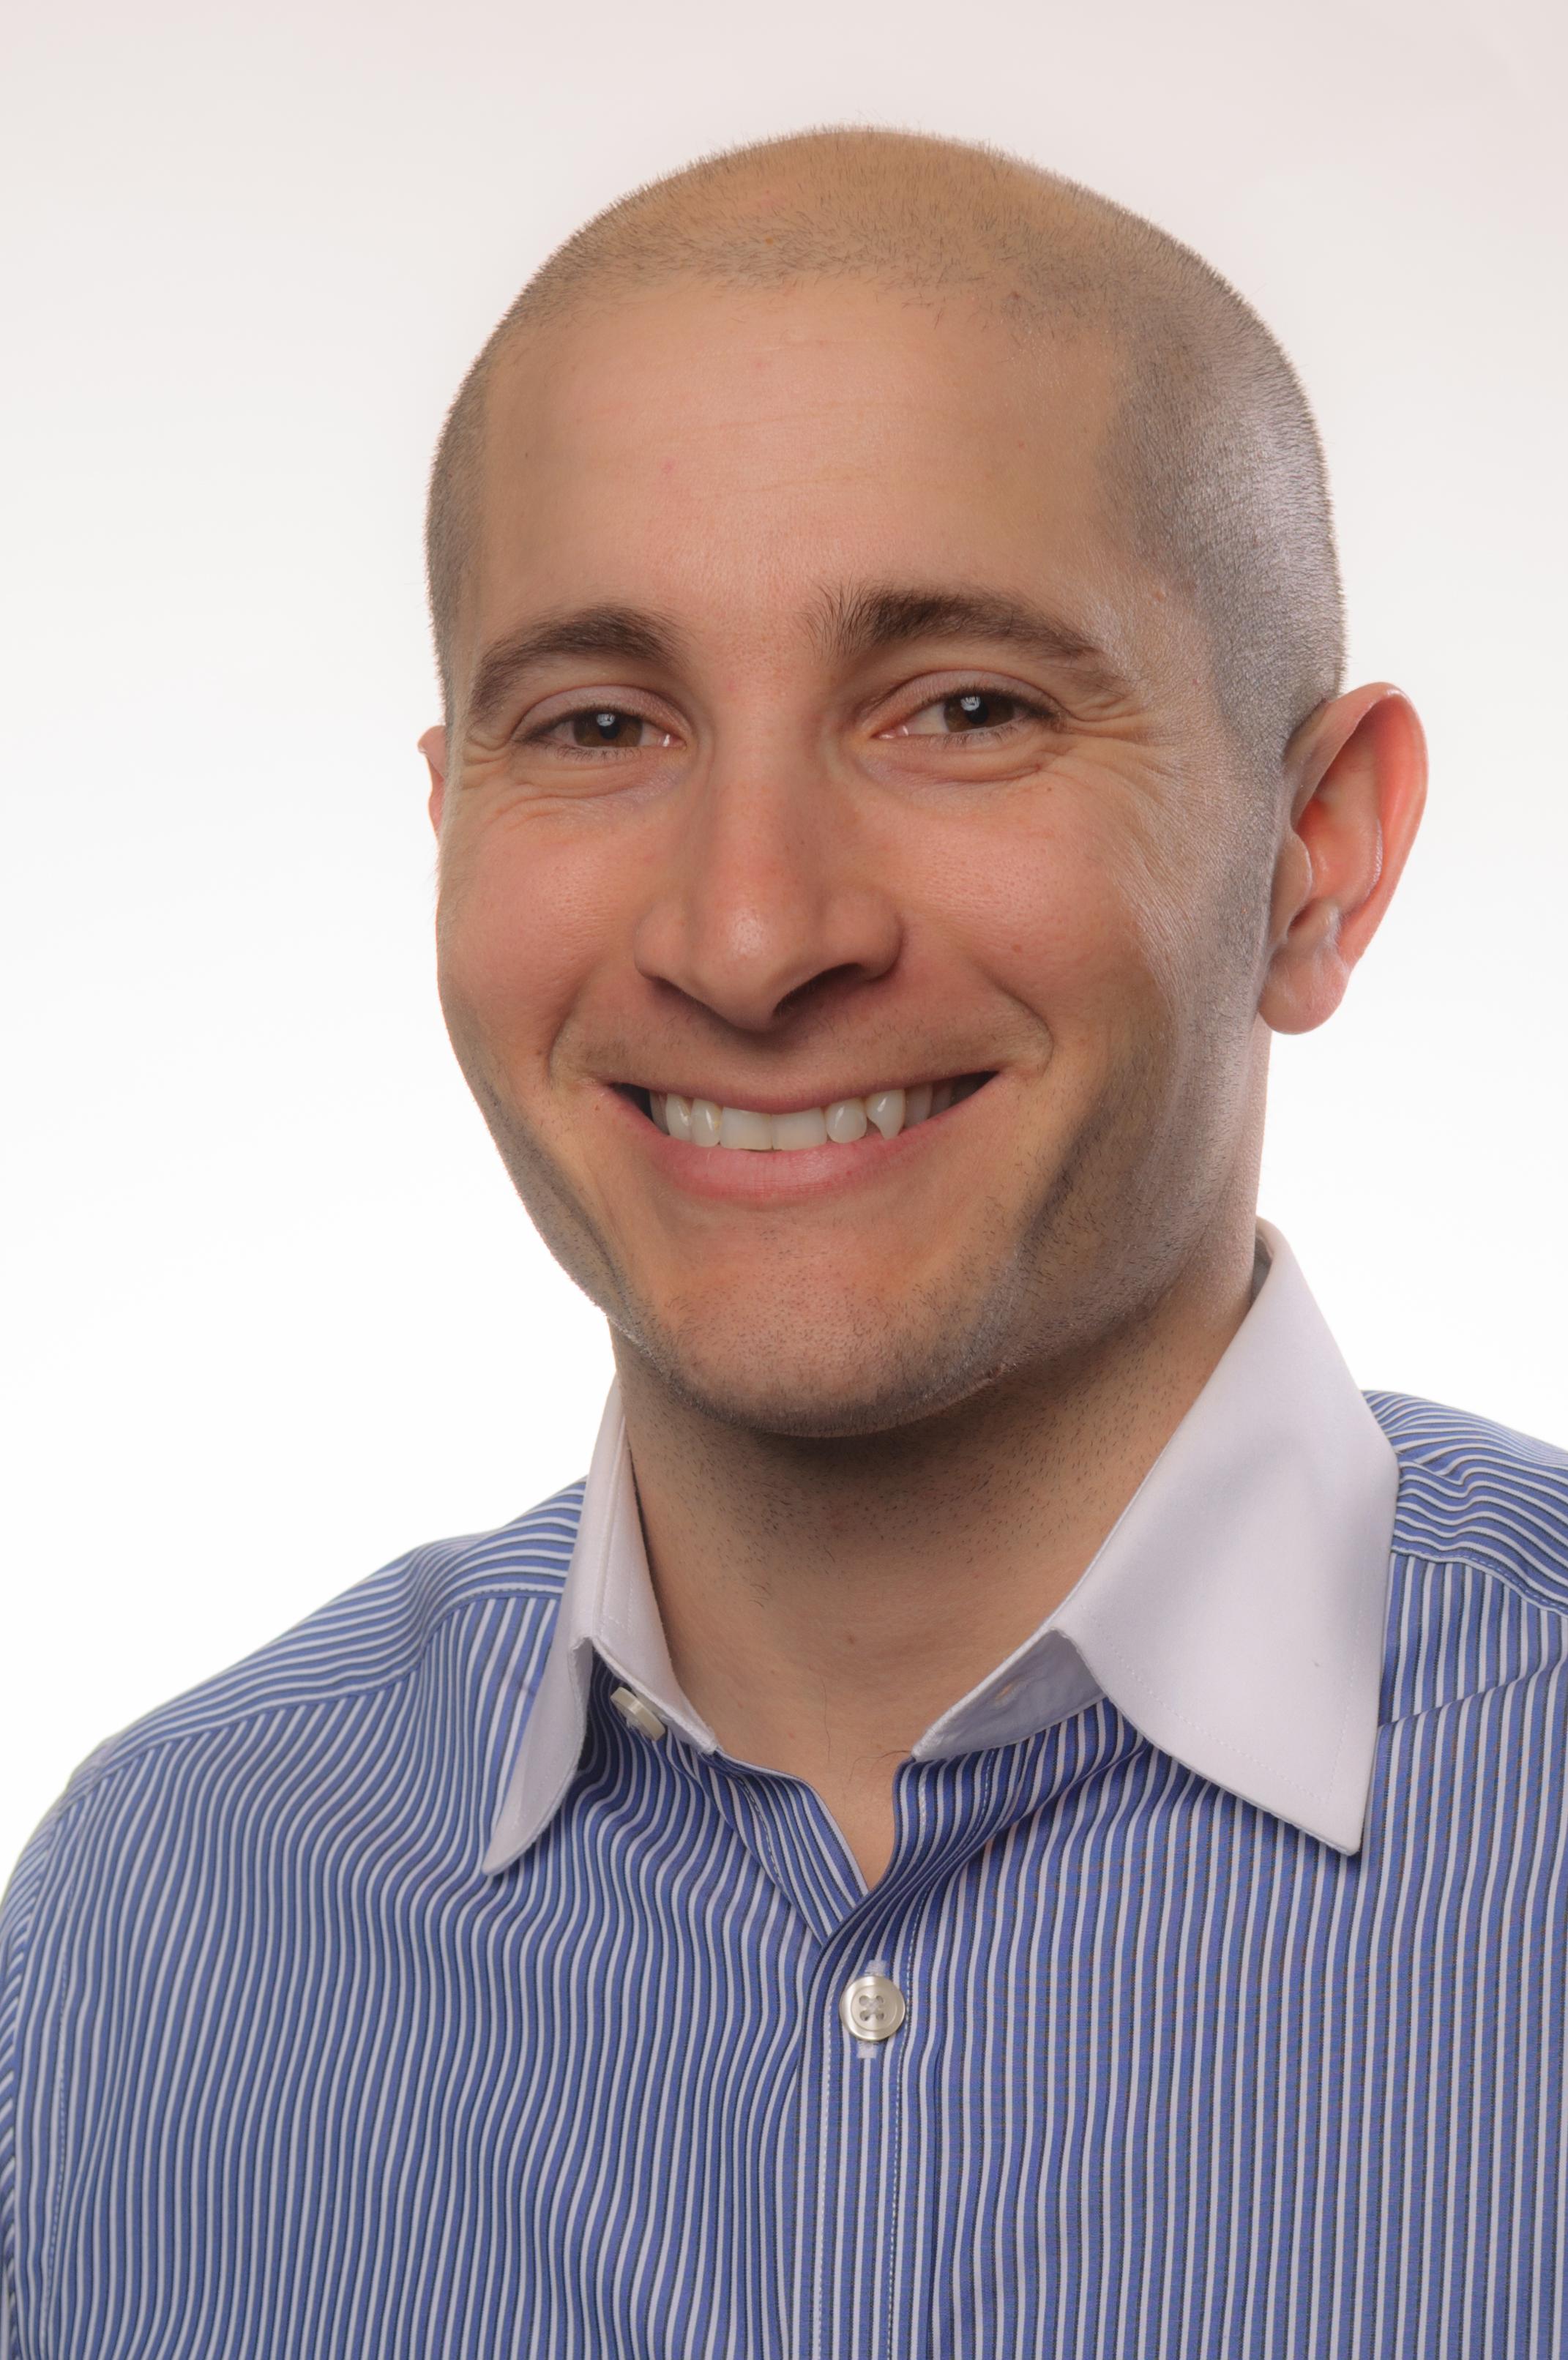 Shay Har-Noy, Senior Director, Geospatial Big Data